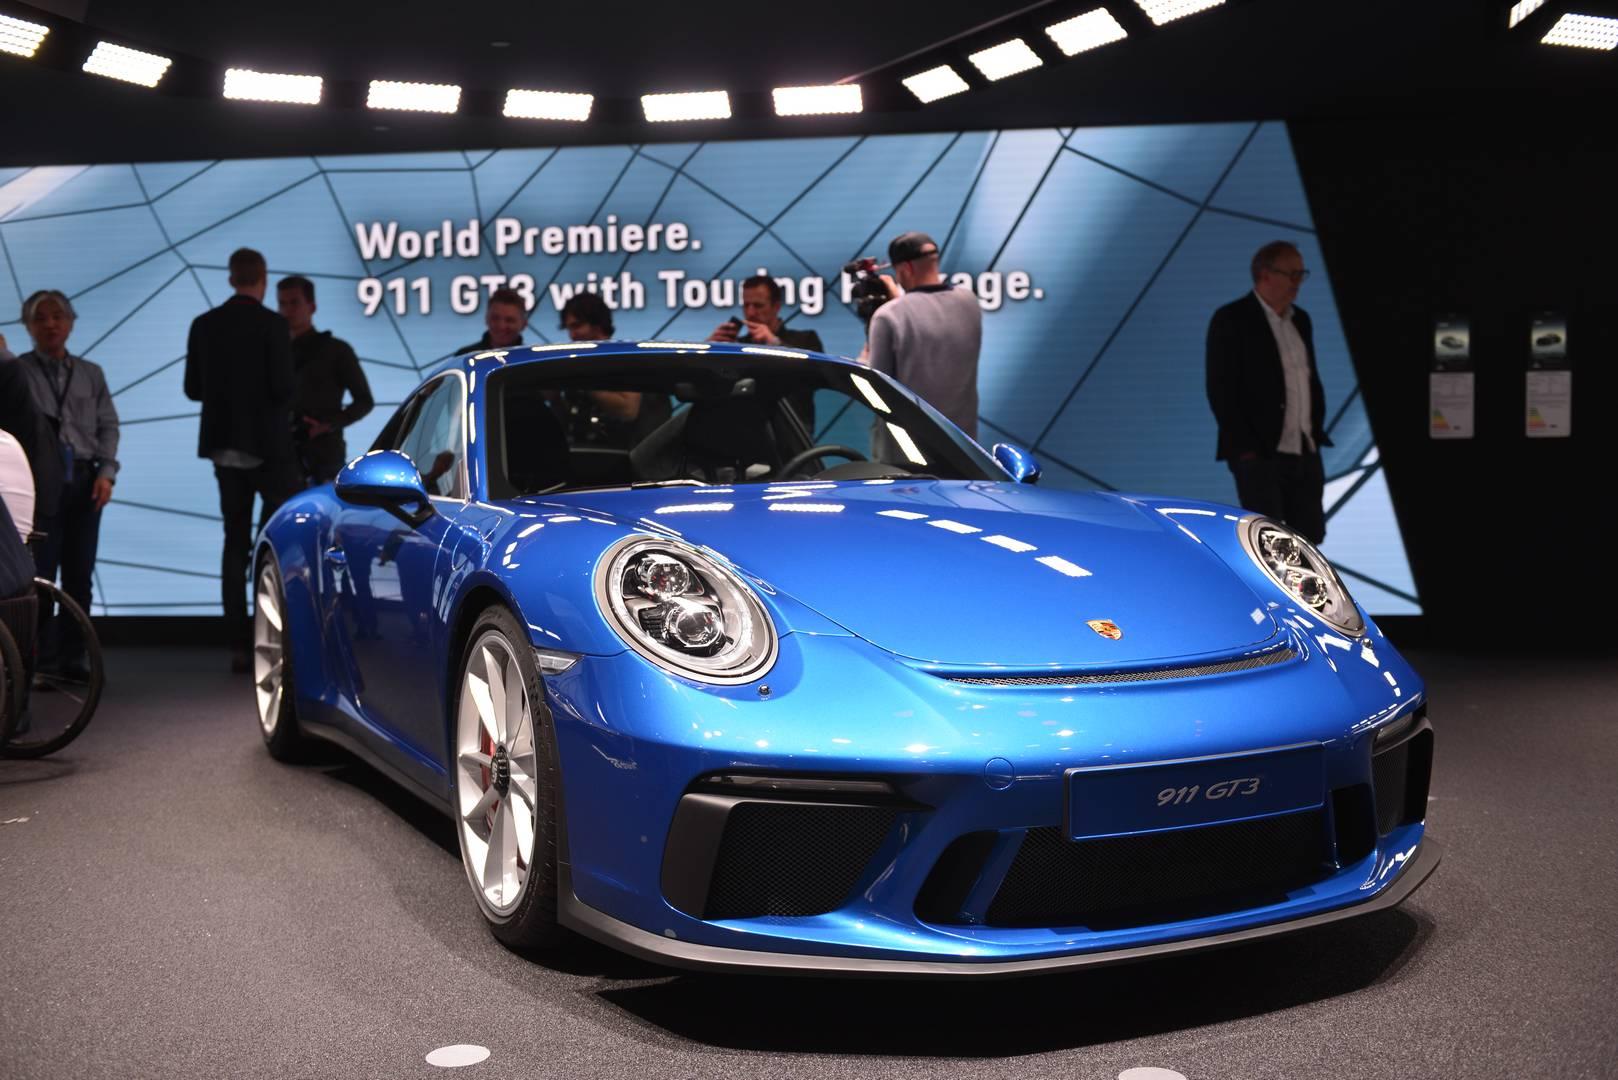 Следите за информацией о Франкфуртском автосалоне 2017 на Топ Тюнинг!